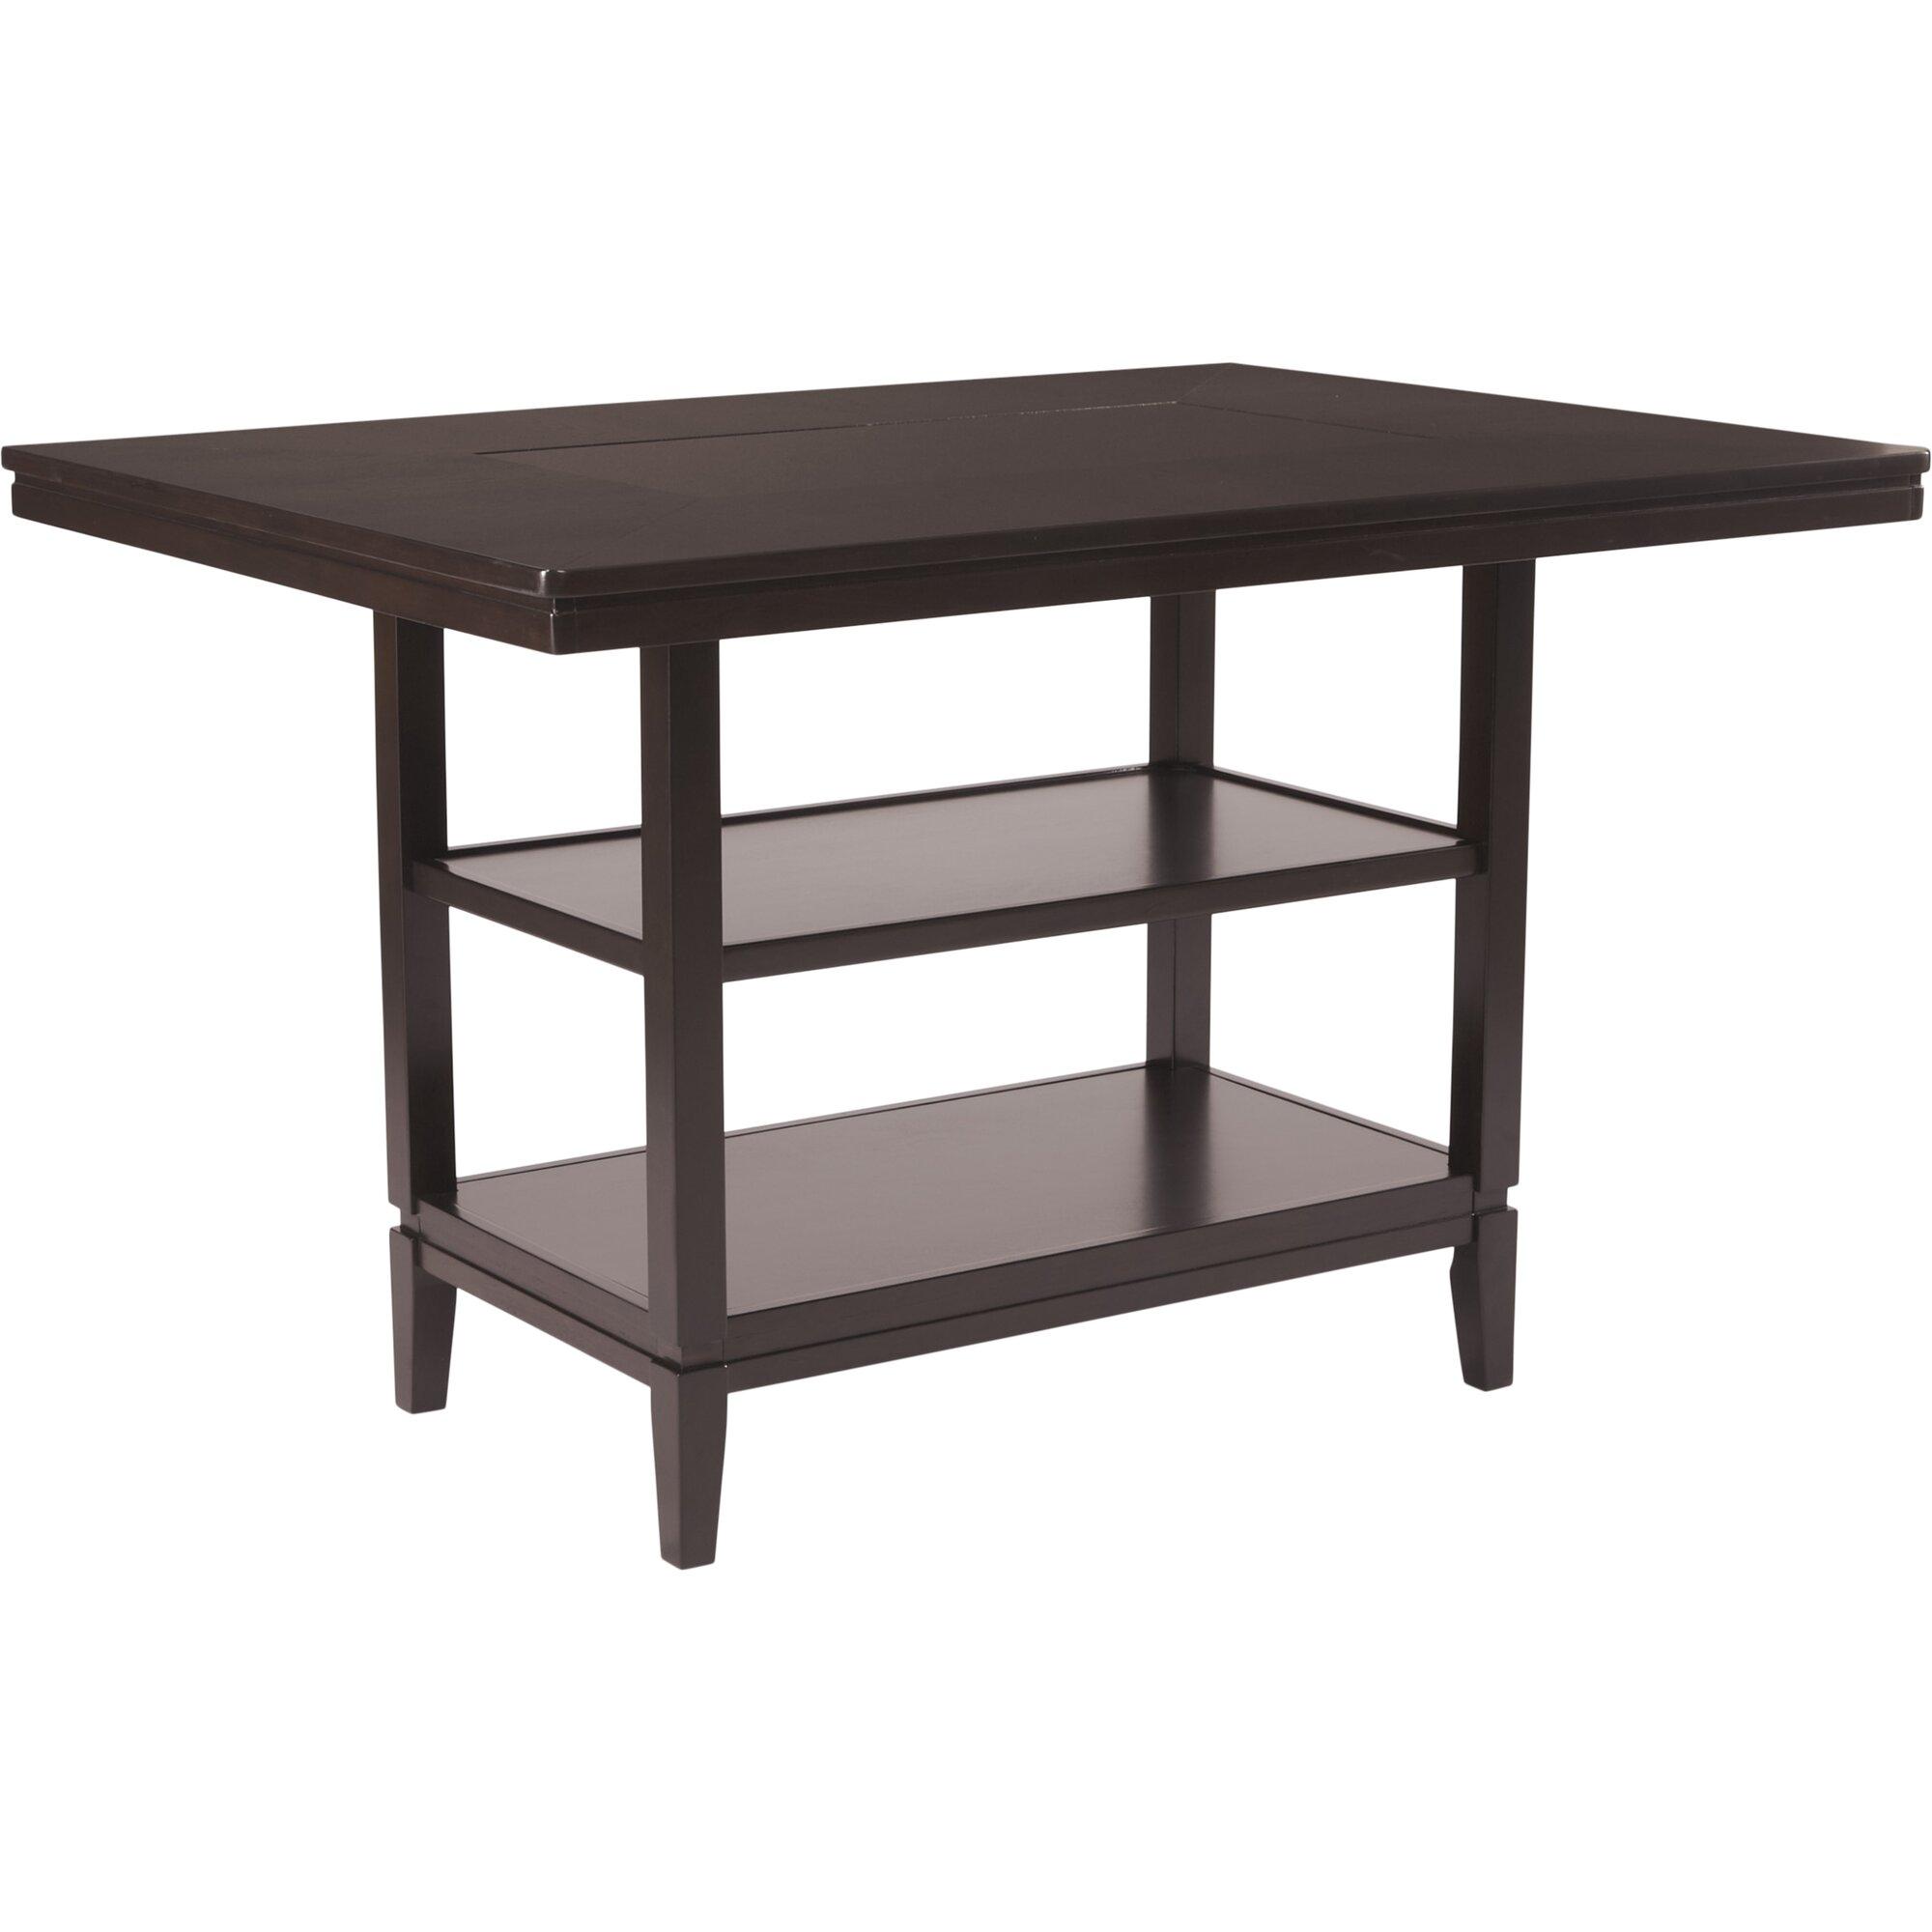 Trishelle Dining Room Table